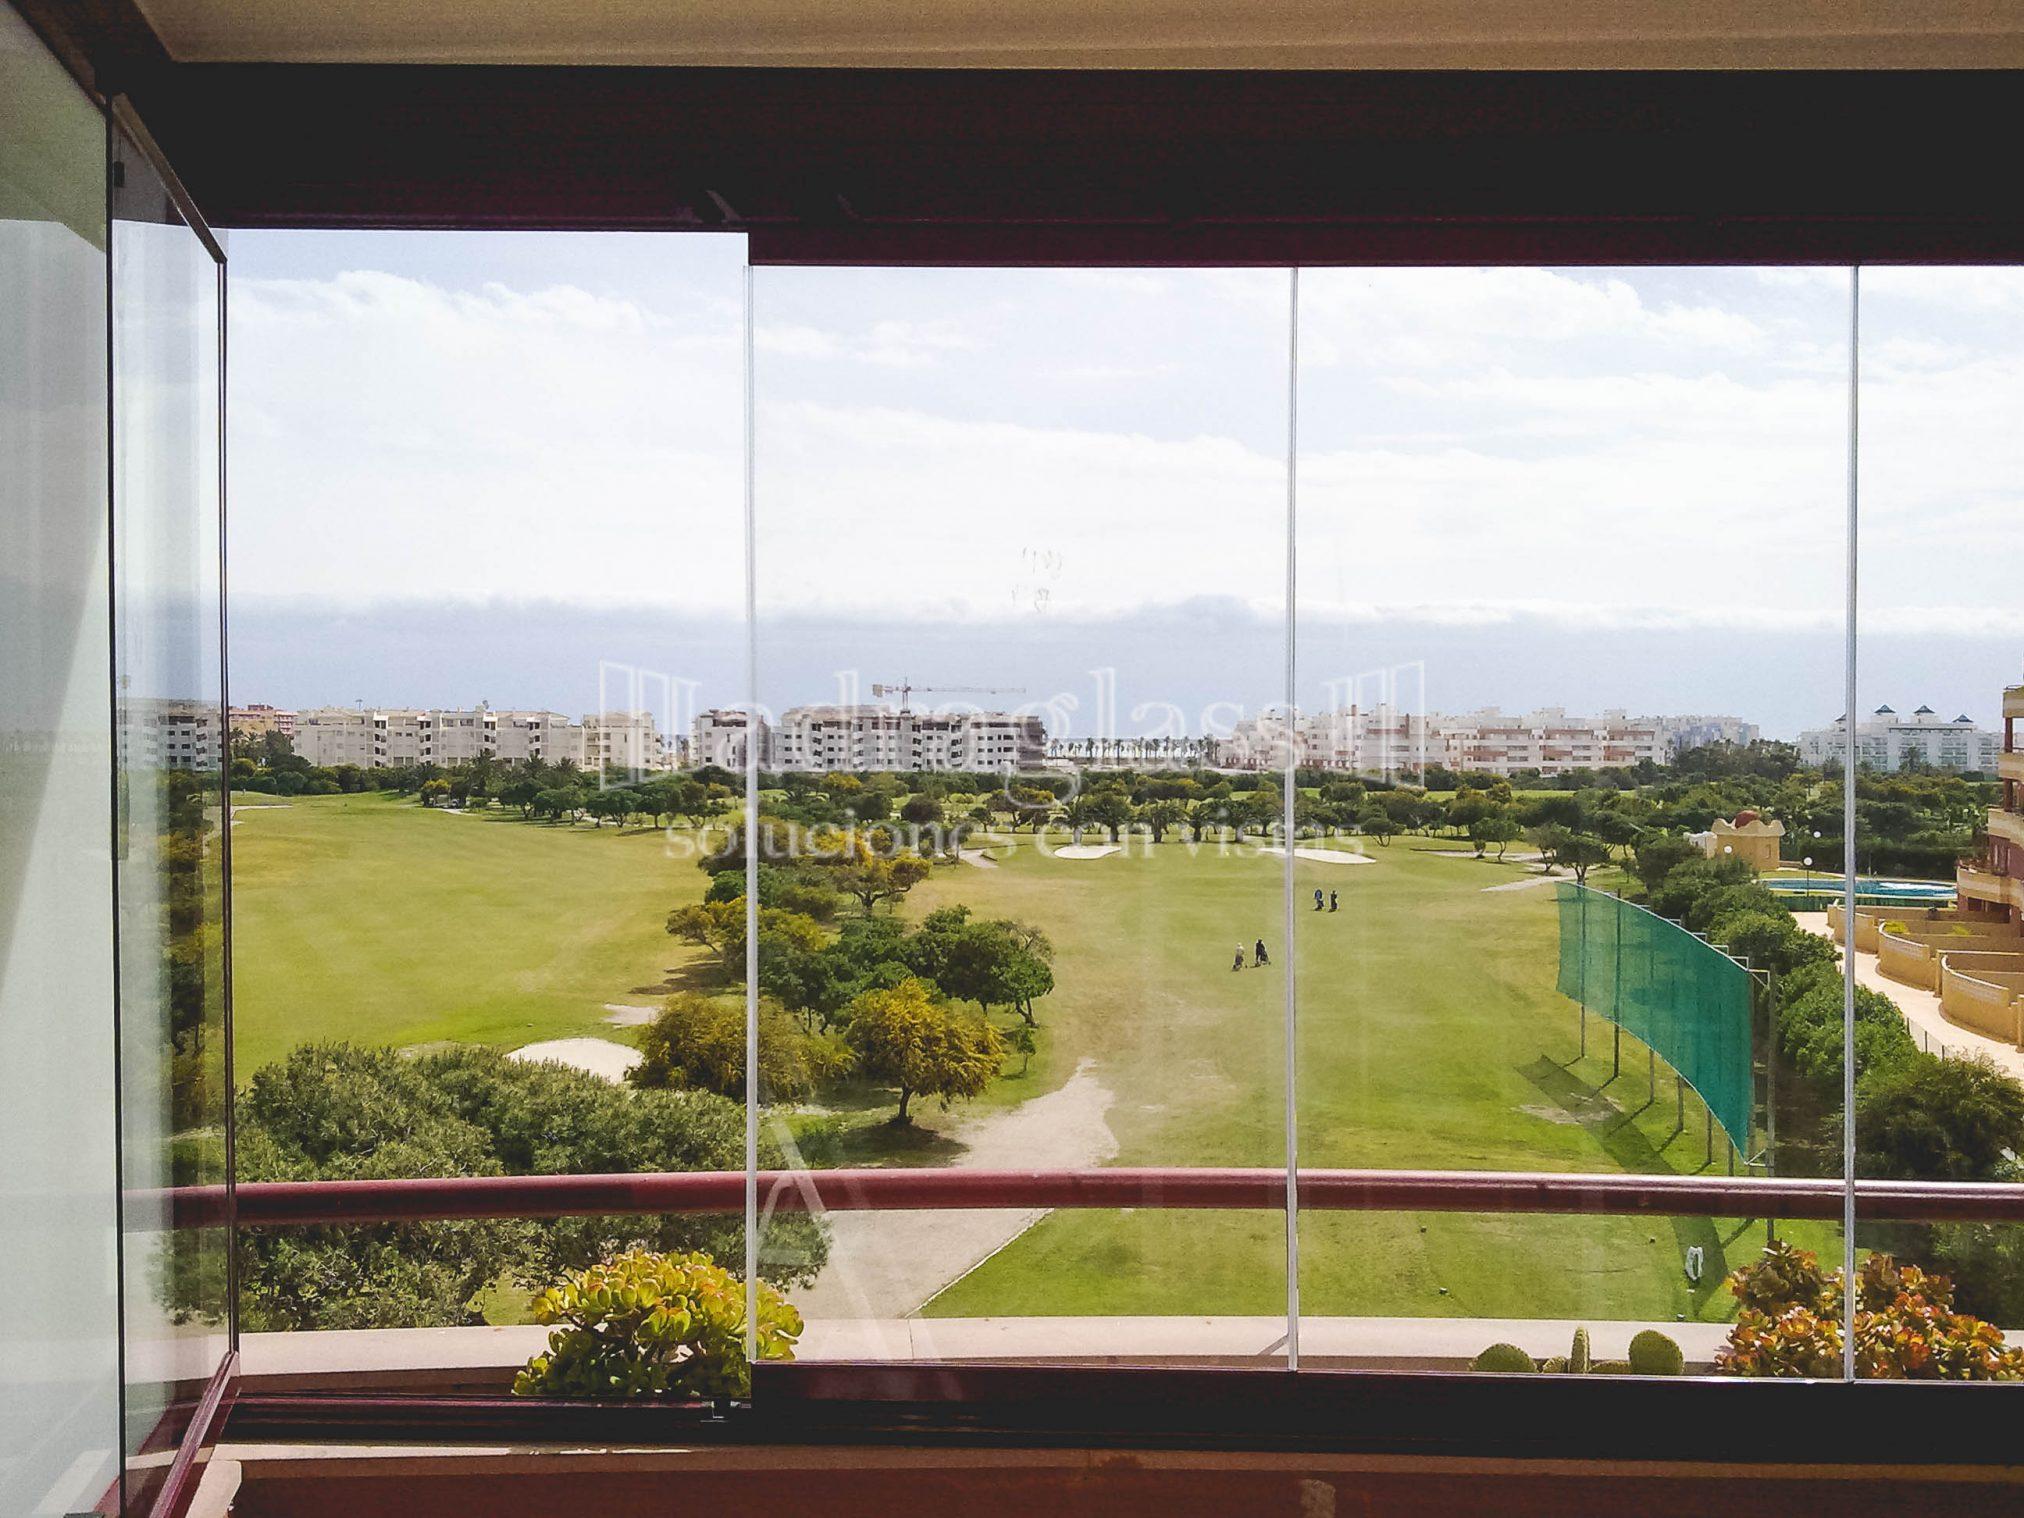 Adraglass cortinas de cristal para terrazas panor micas - Cortina para terraza ...